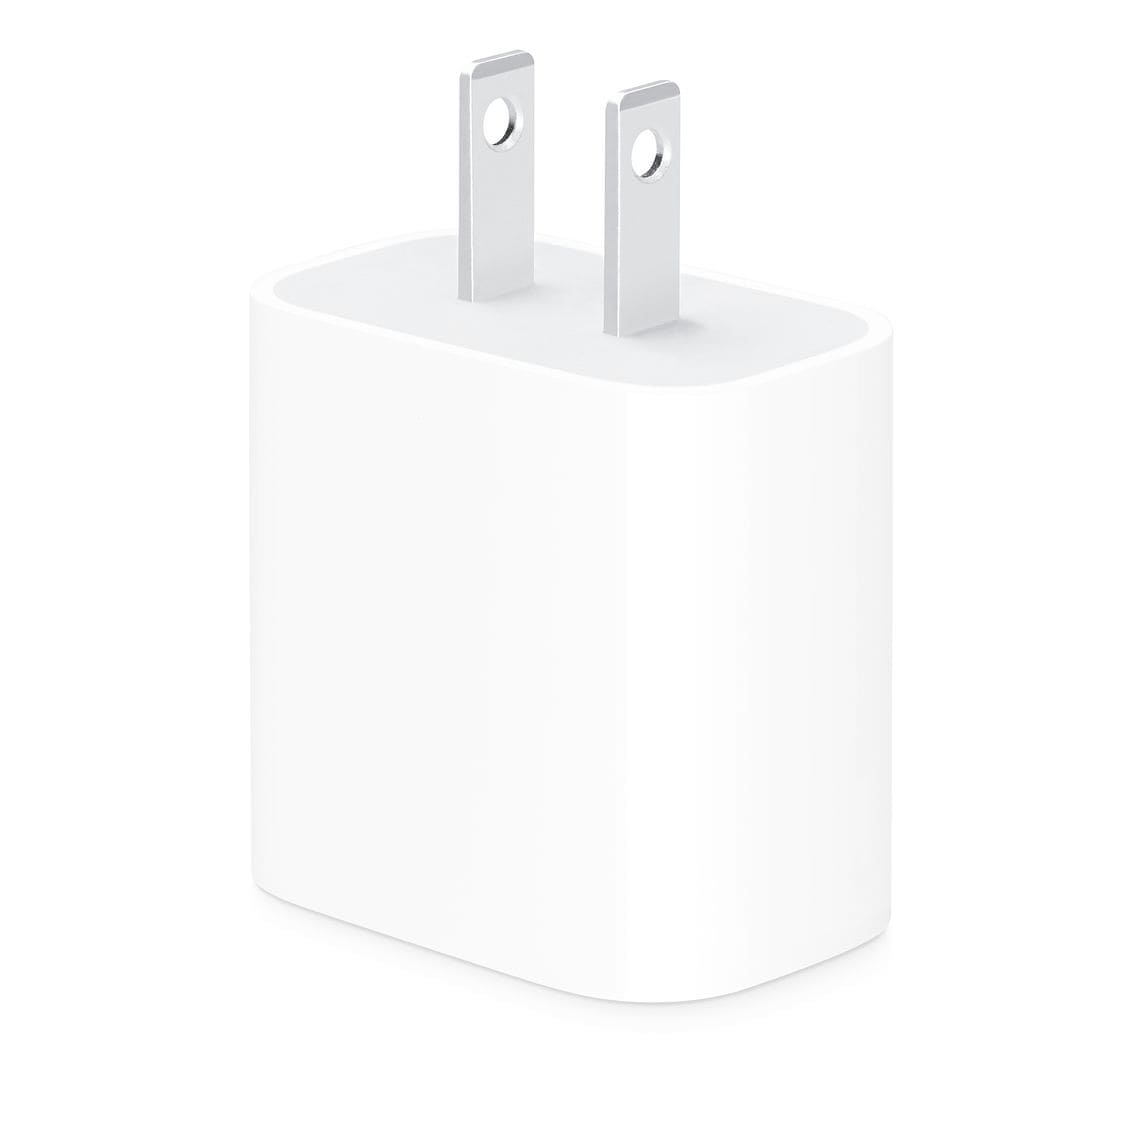 Adaptateur Apple USB-C